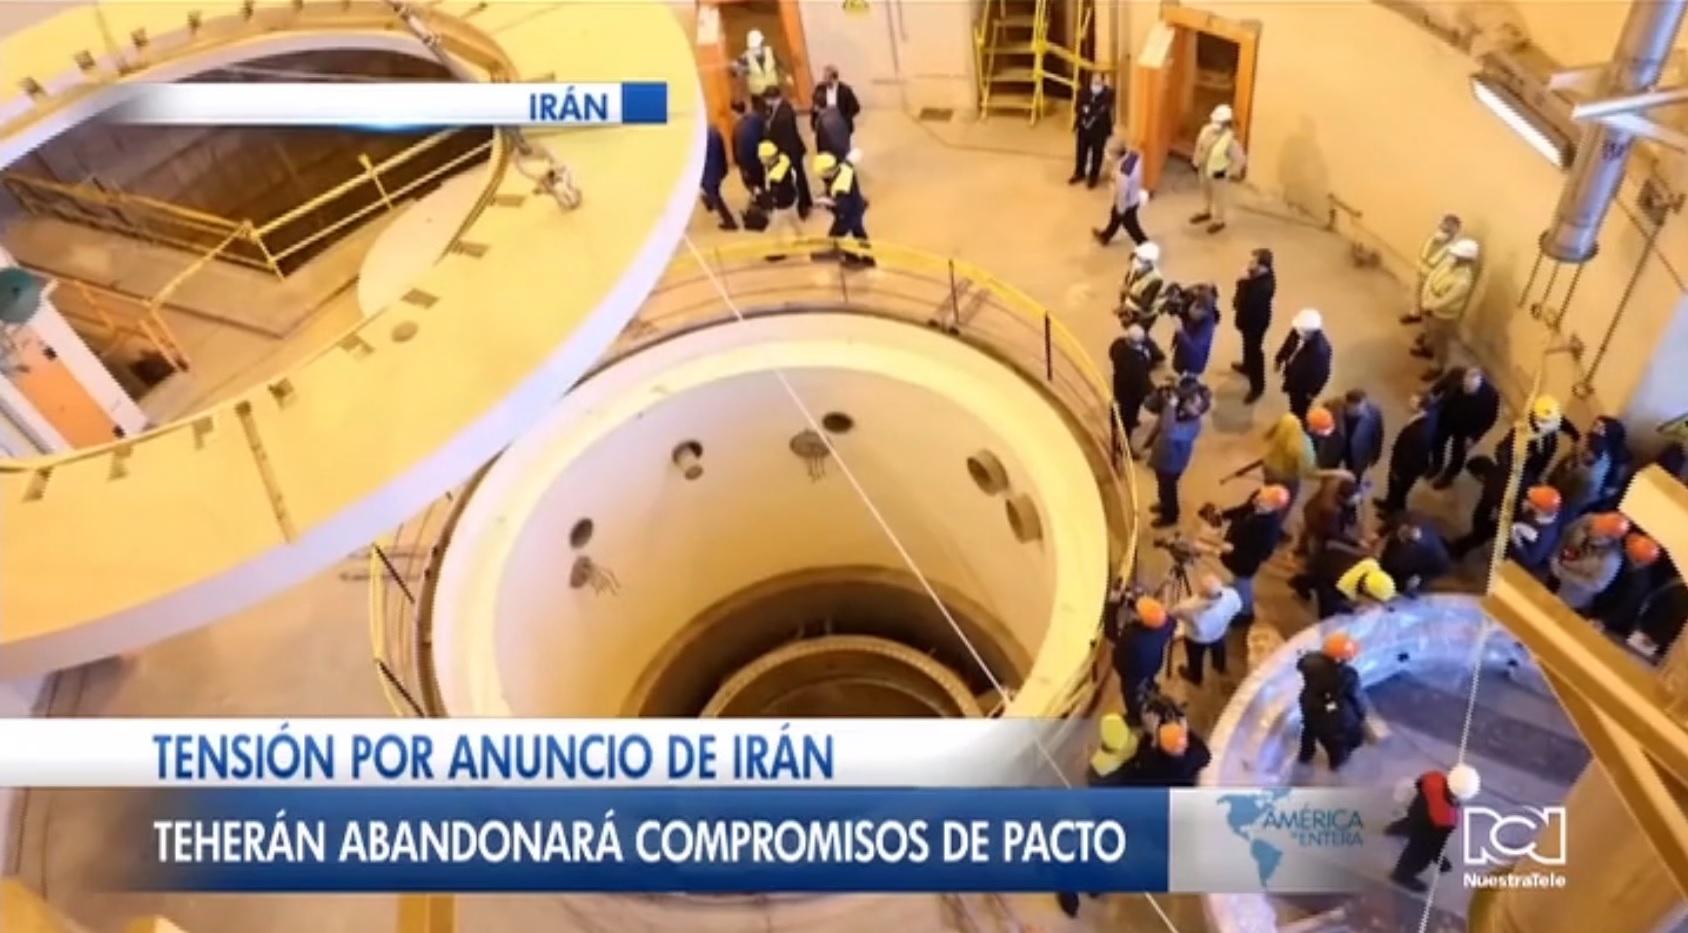 Irán confirma que abandonará compromisos del pacto nuclear tras muerte de Suleimani